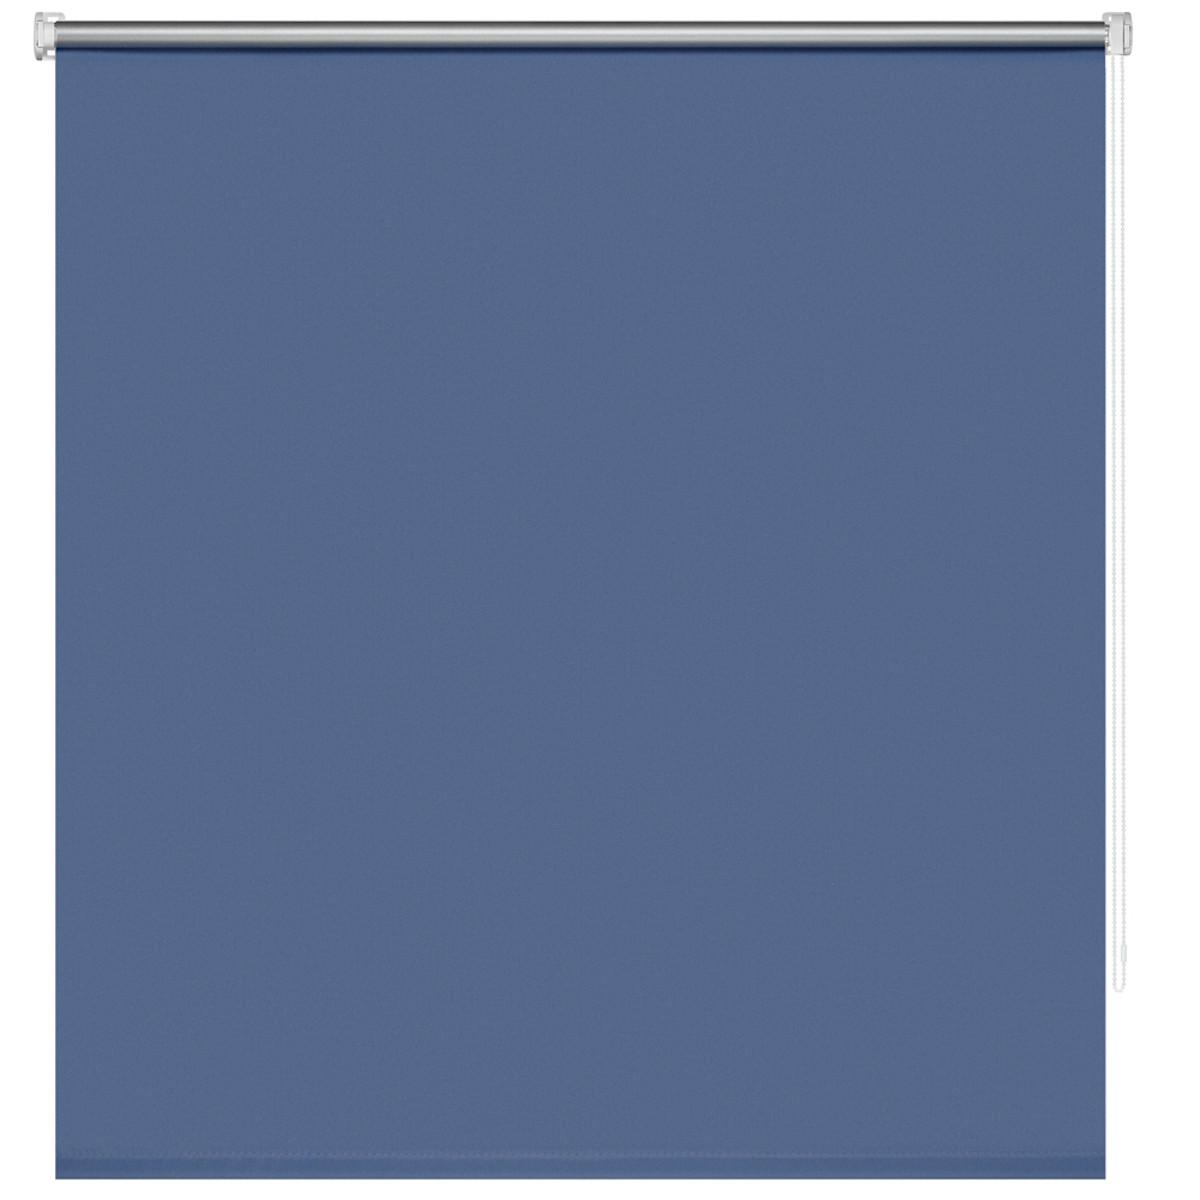 Рулонная Ора Decofest Блэкаут Плайн 120Х160 Цвет Синий